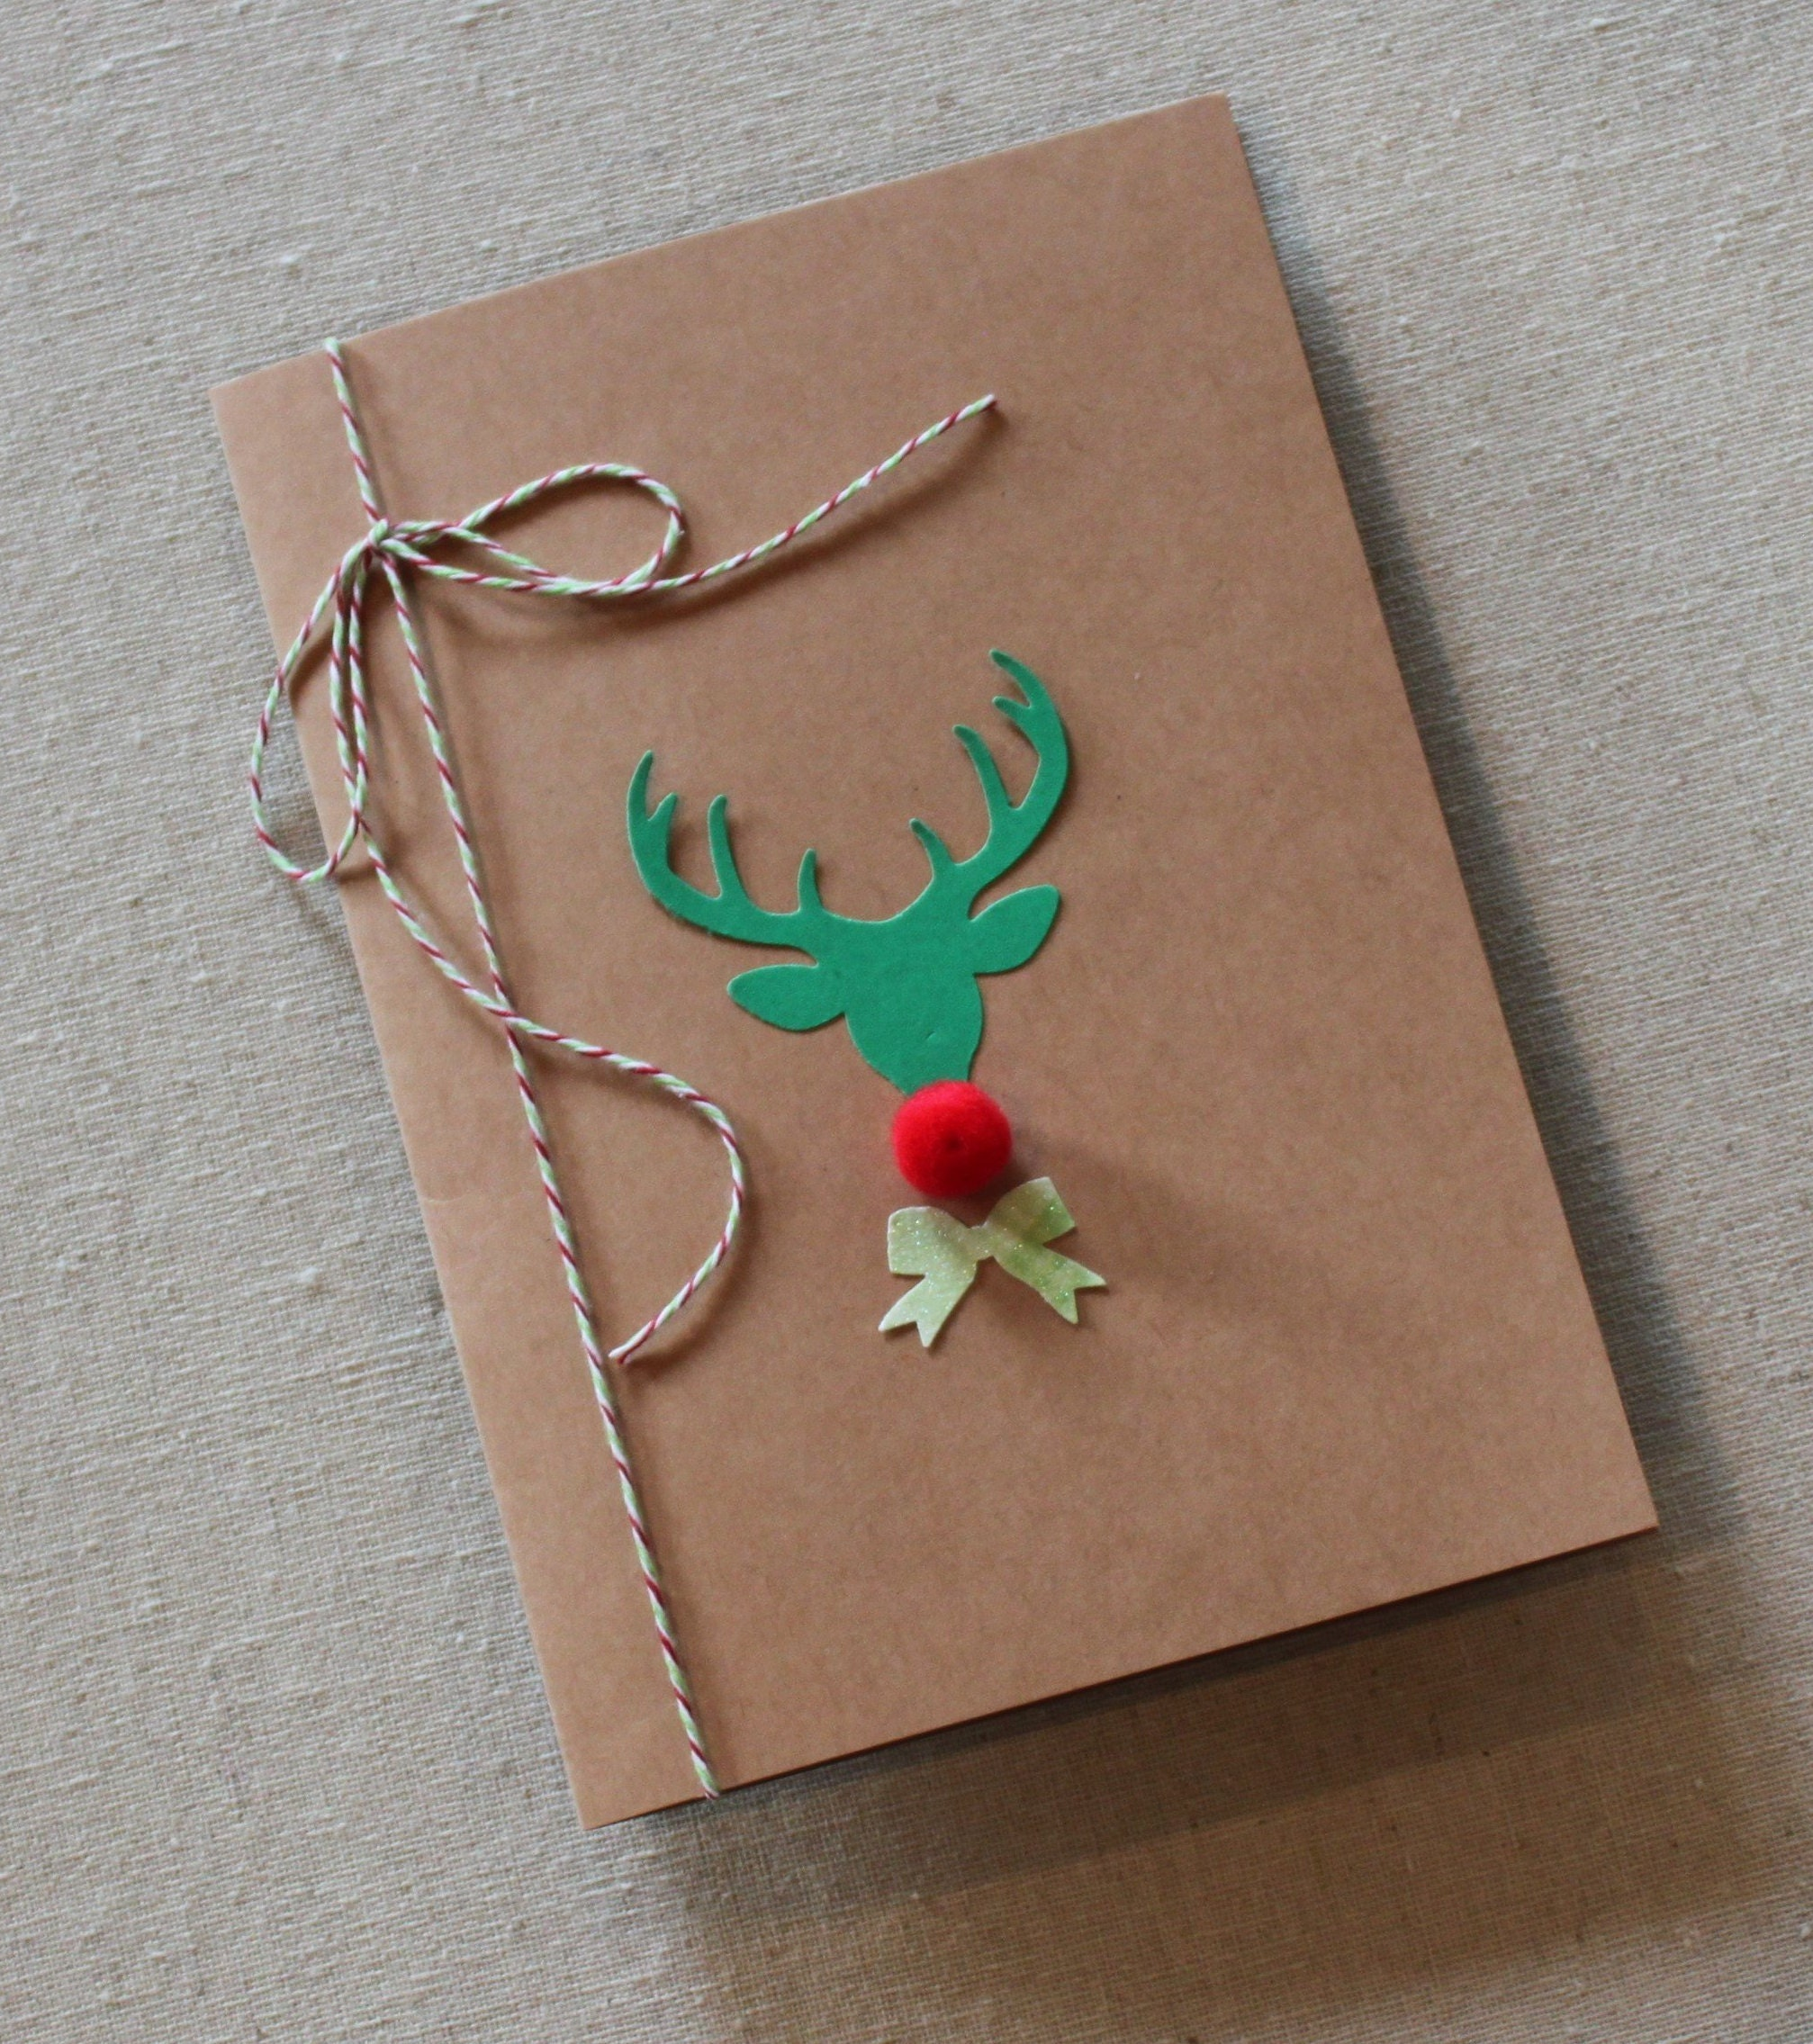 Holiday Oh Deer Kraft DIY Greeting Card Kit Includes 5x7 Card | Etsy